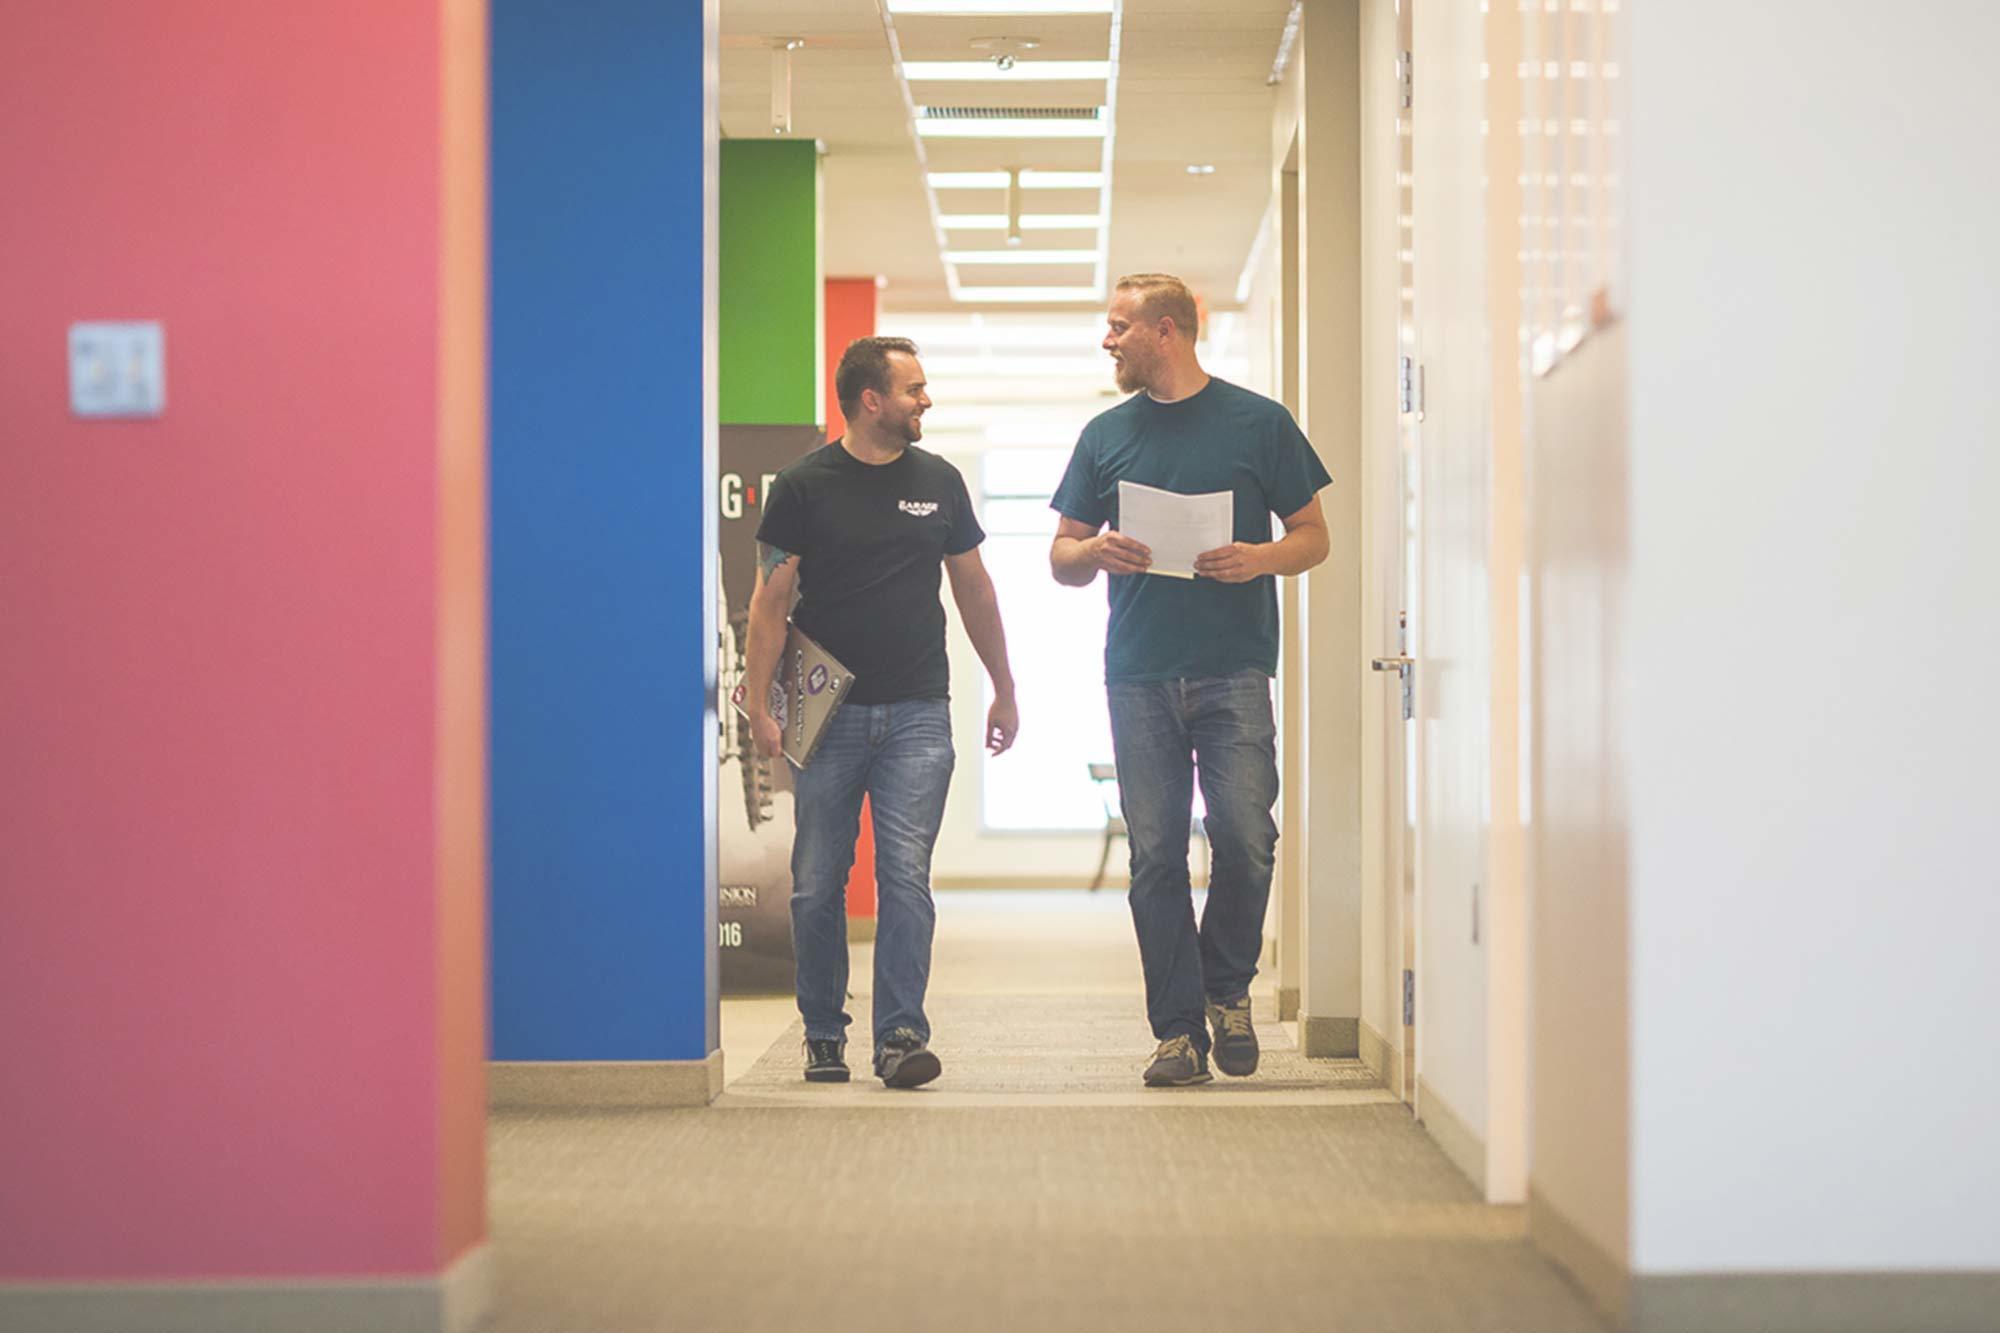 Hero hallway